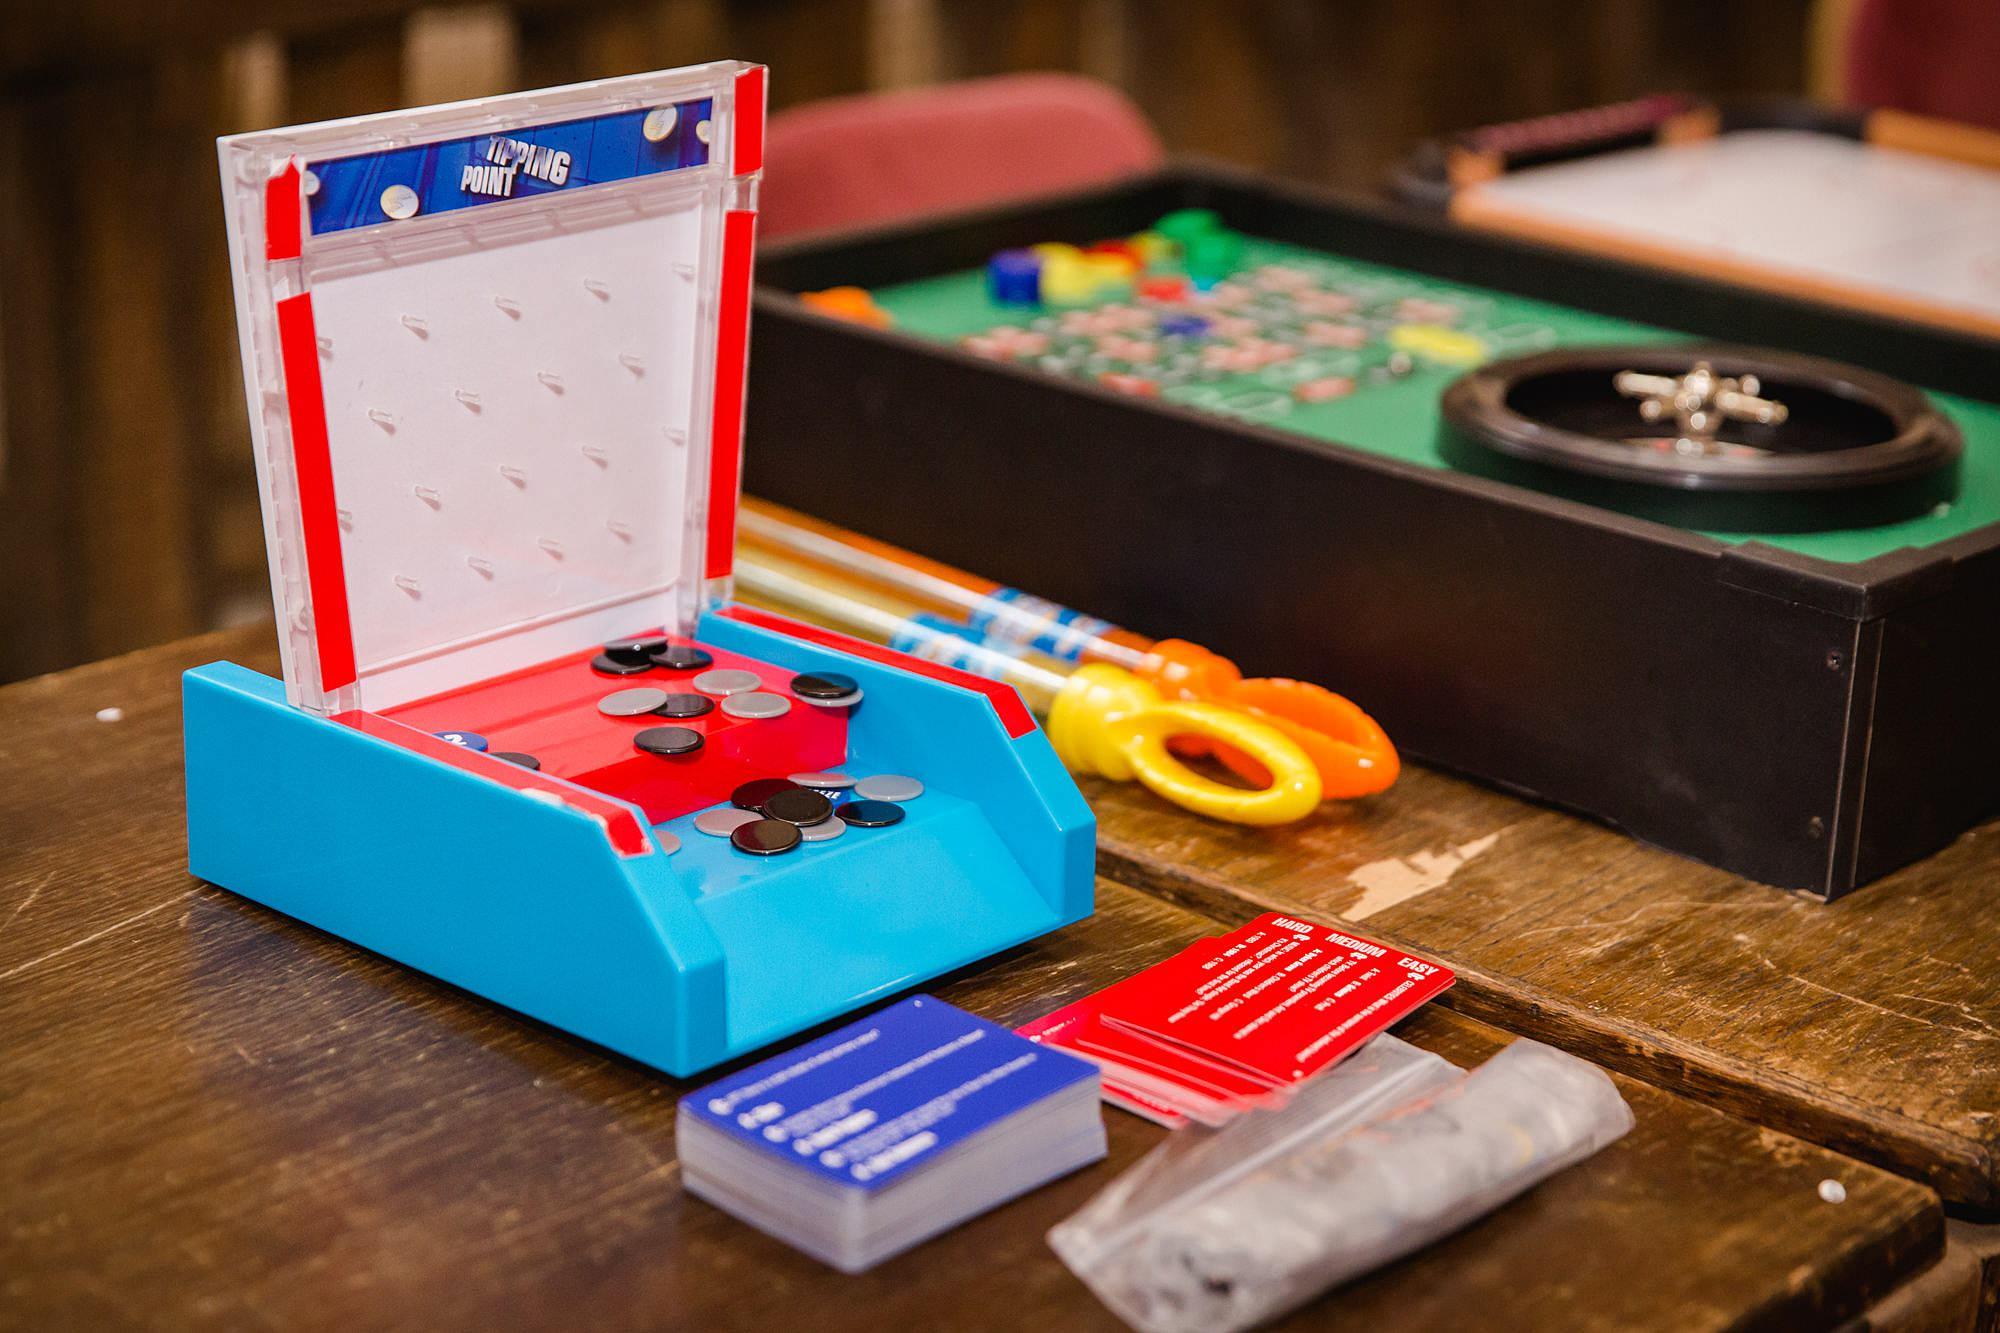 Fun DIY wedding board games set up